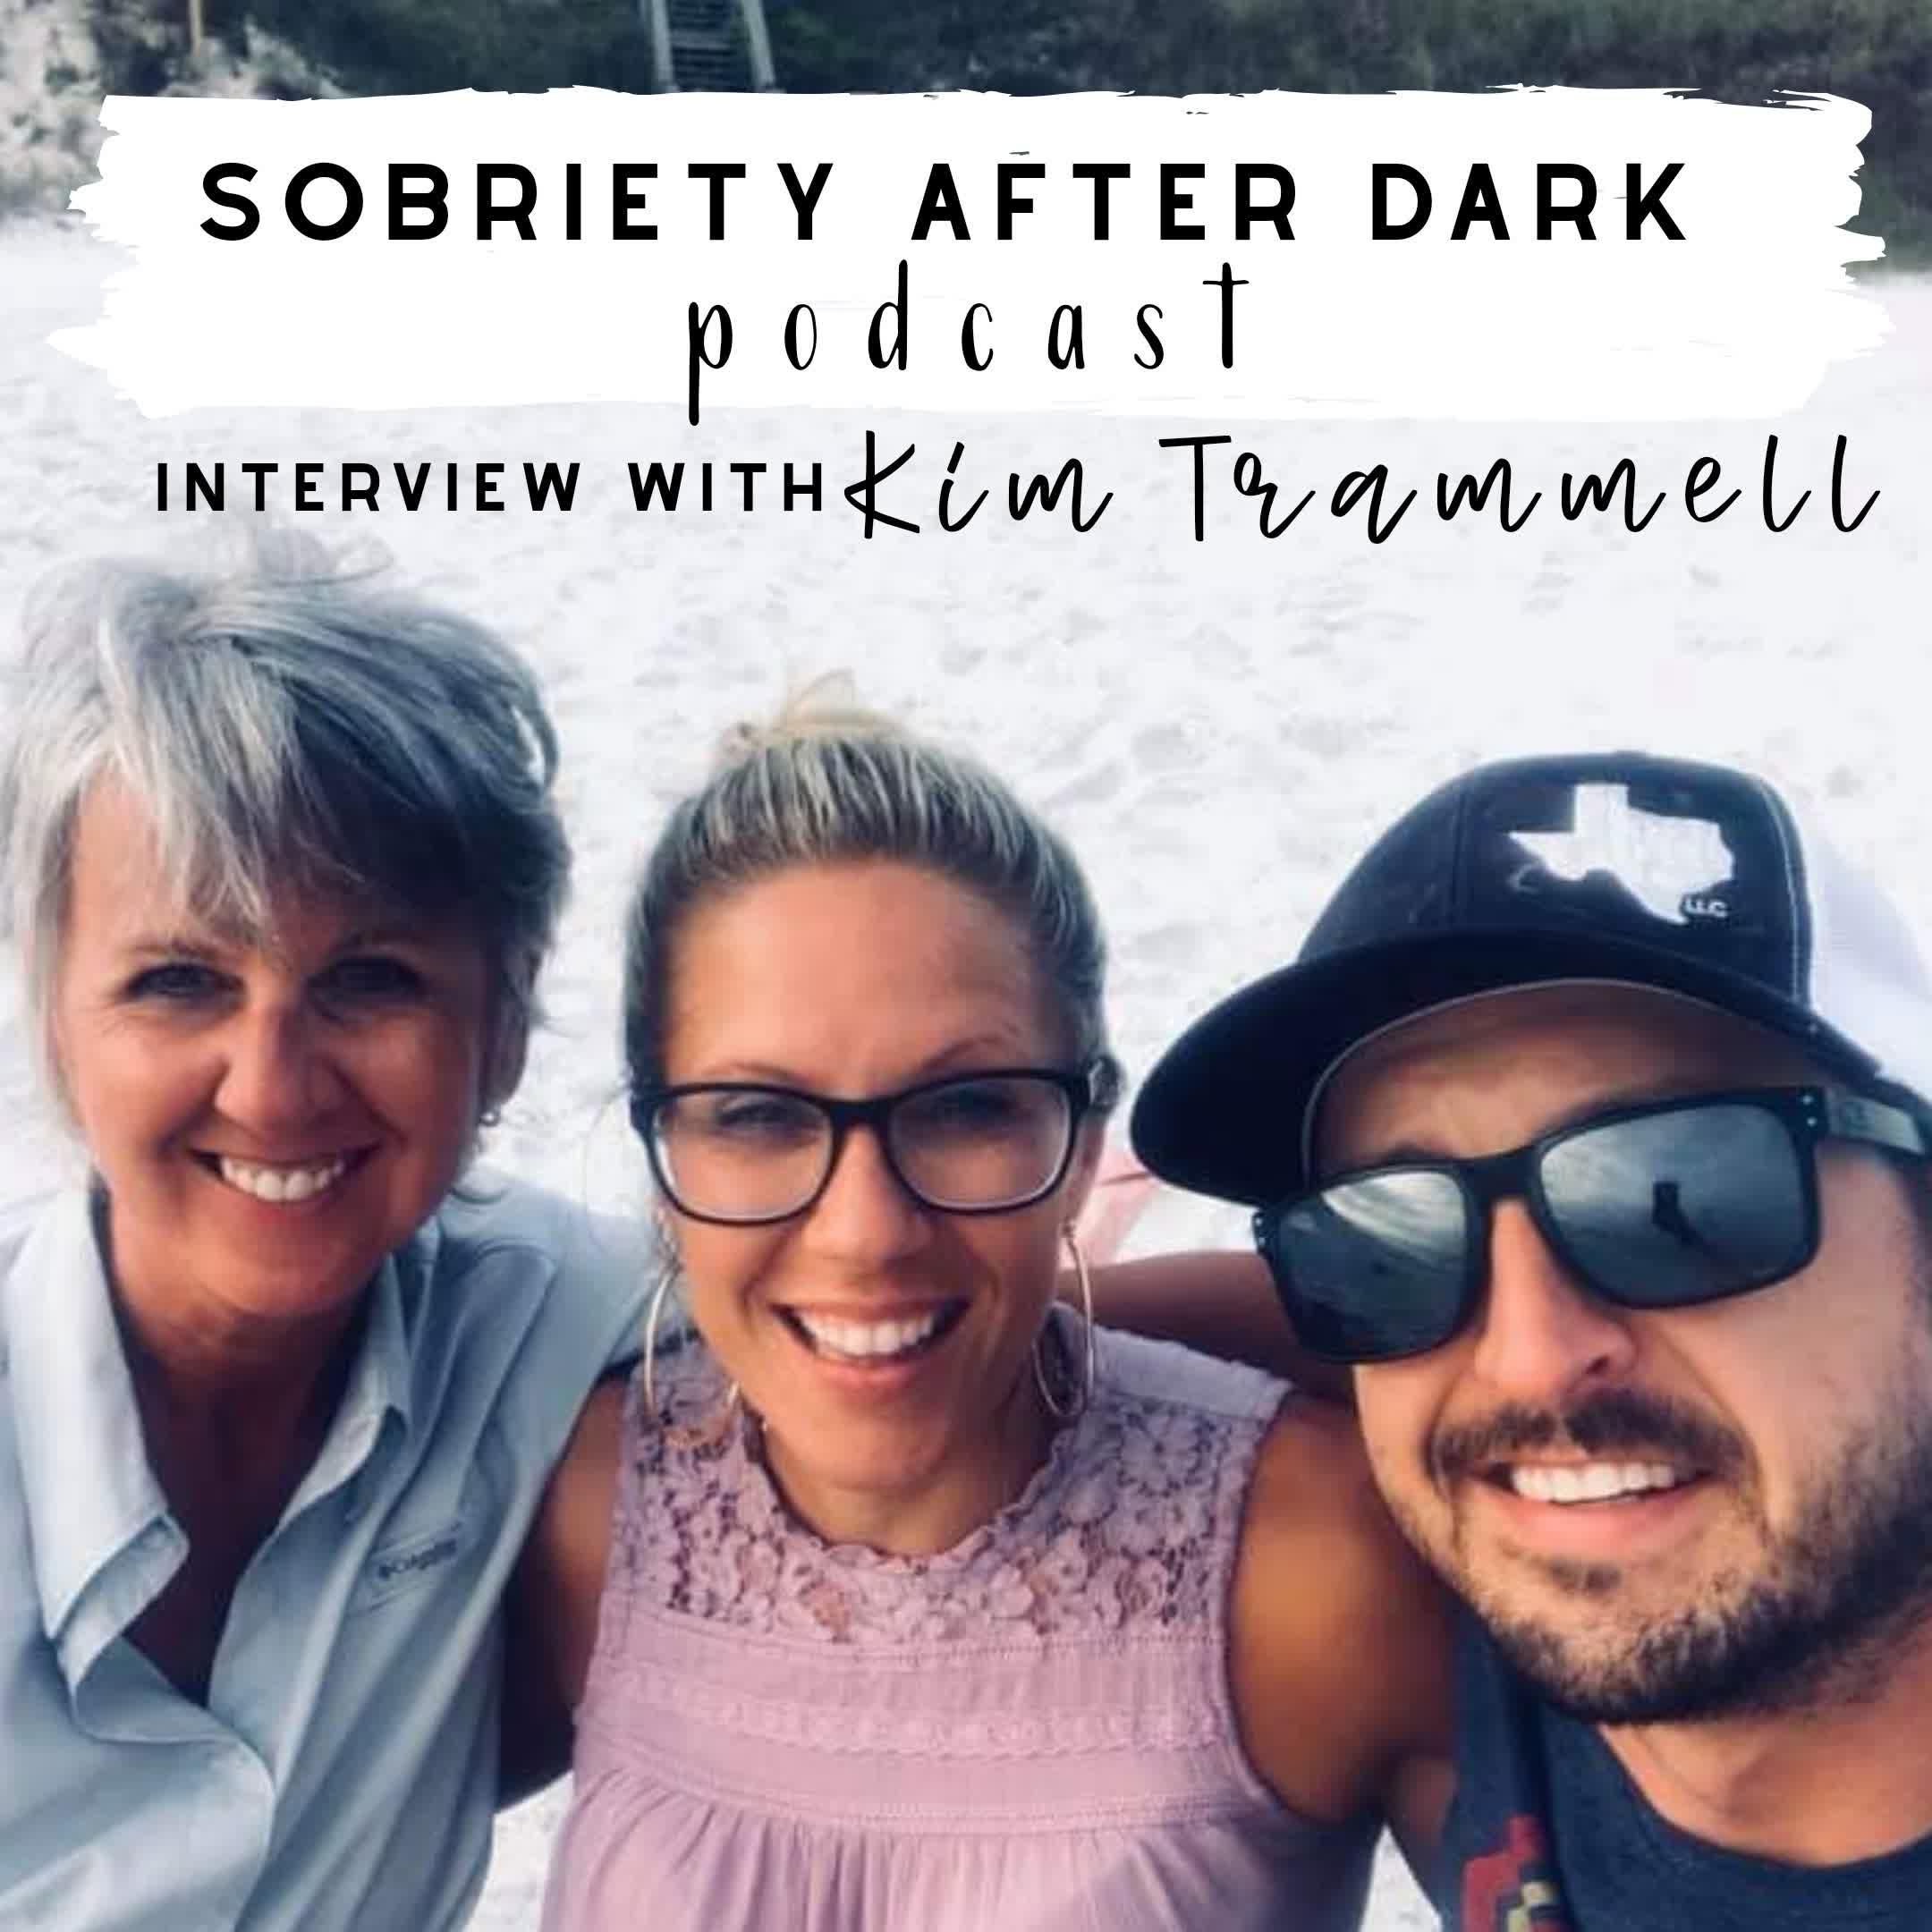 Kim Trammell Interview- Rockstar Drummer turned Healing Massage Therapist